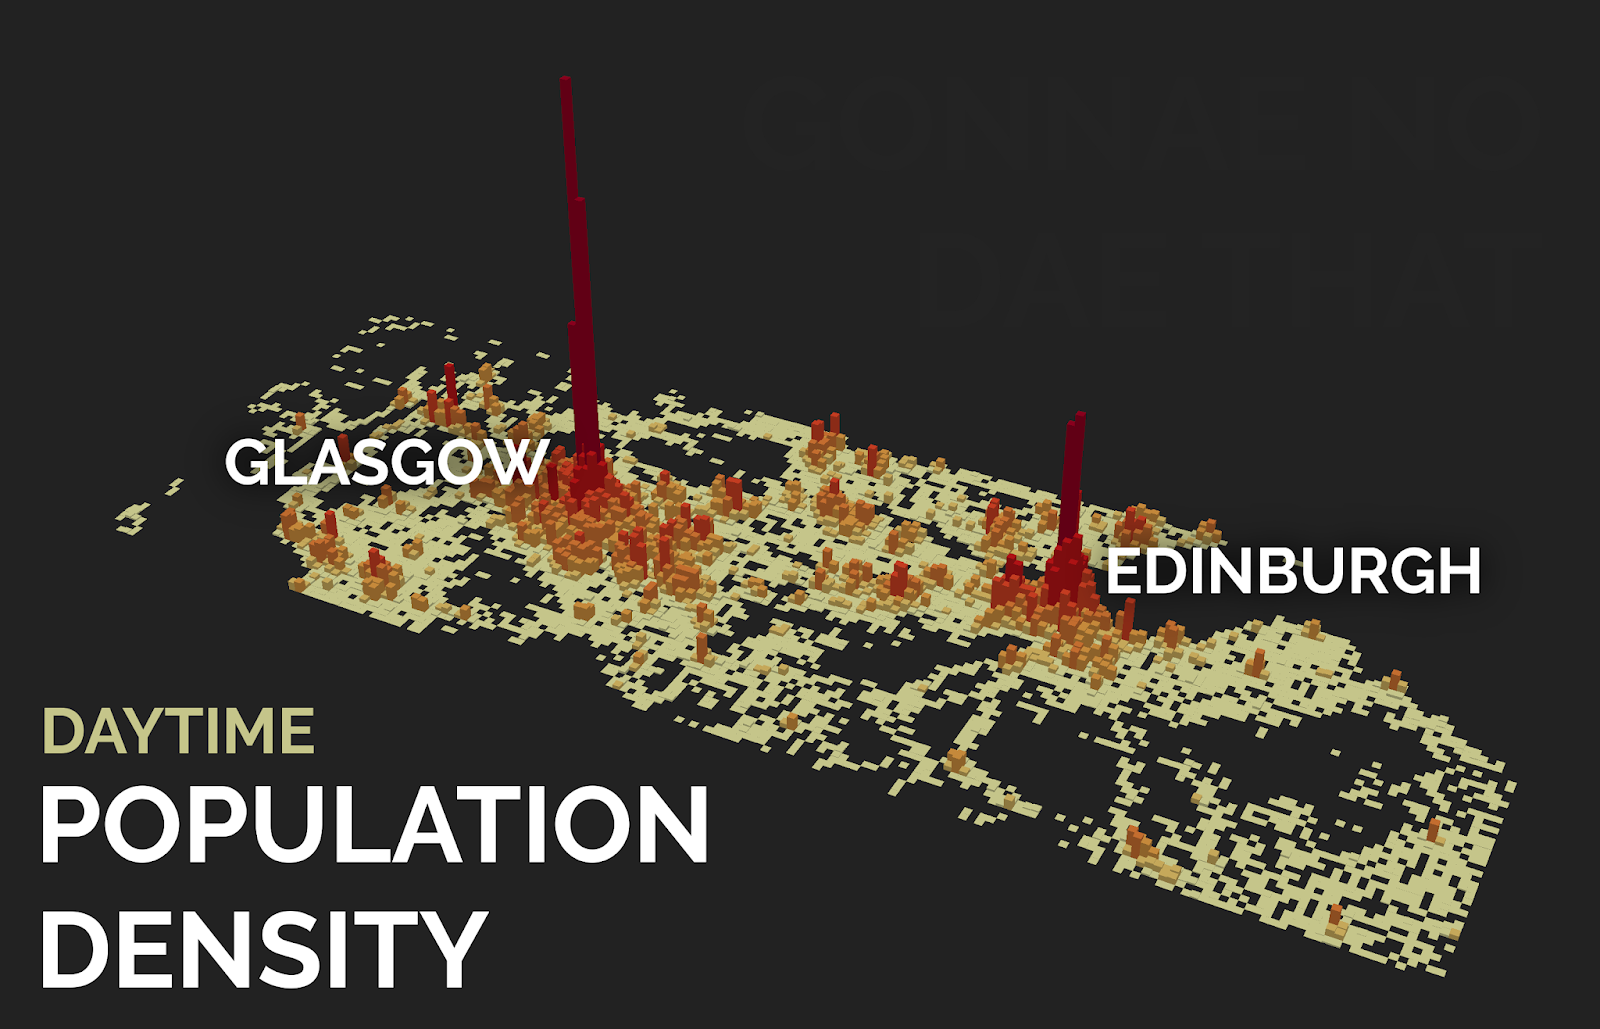 Glasgow has the highest daytime population density